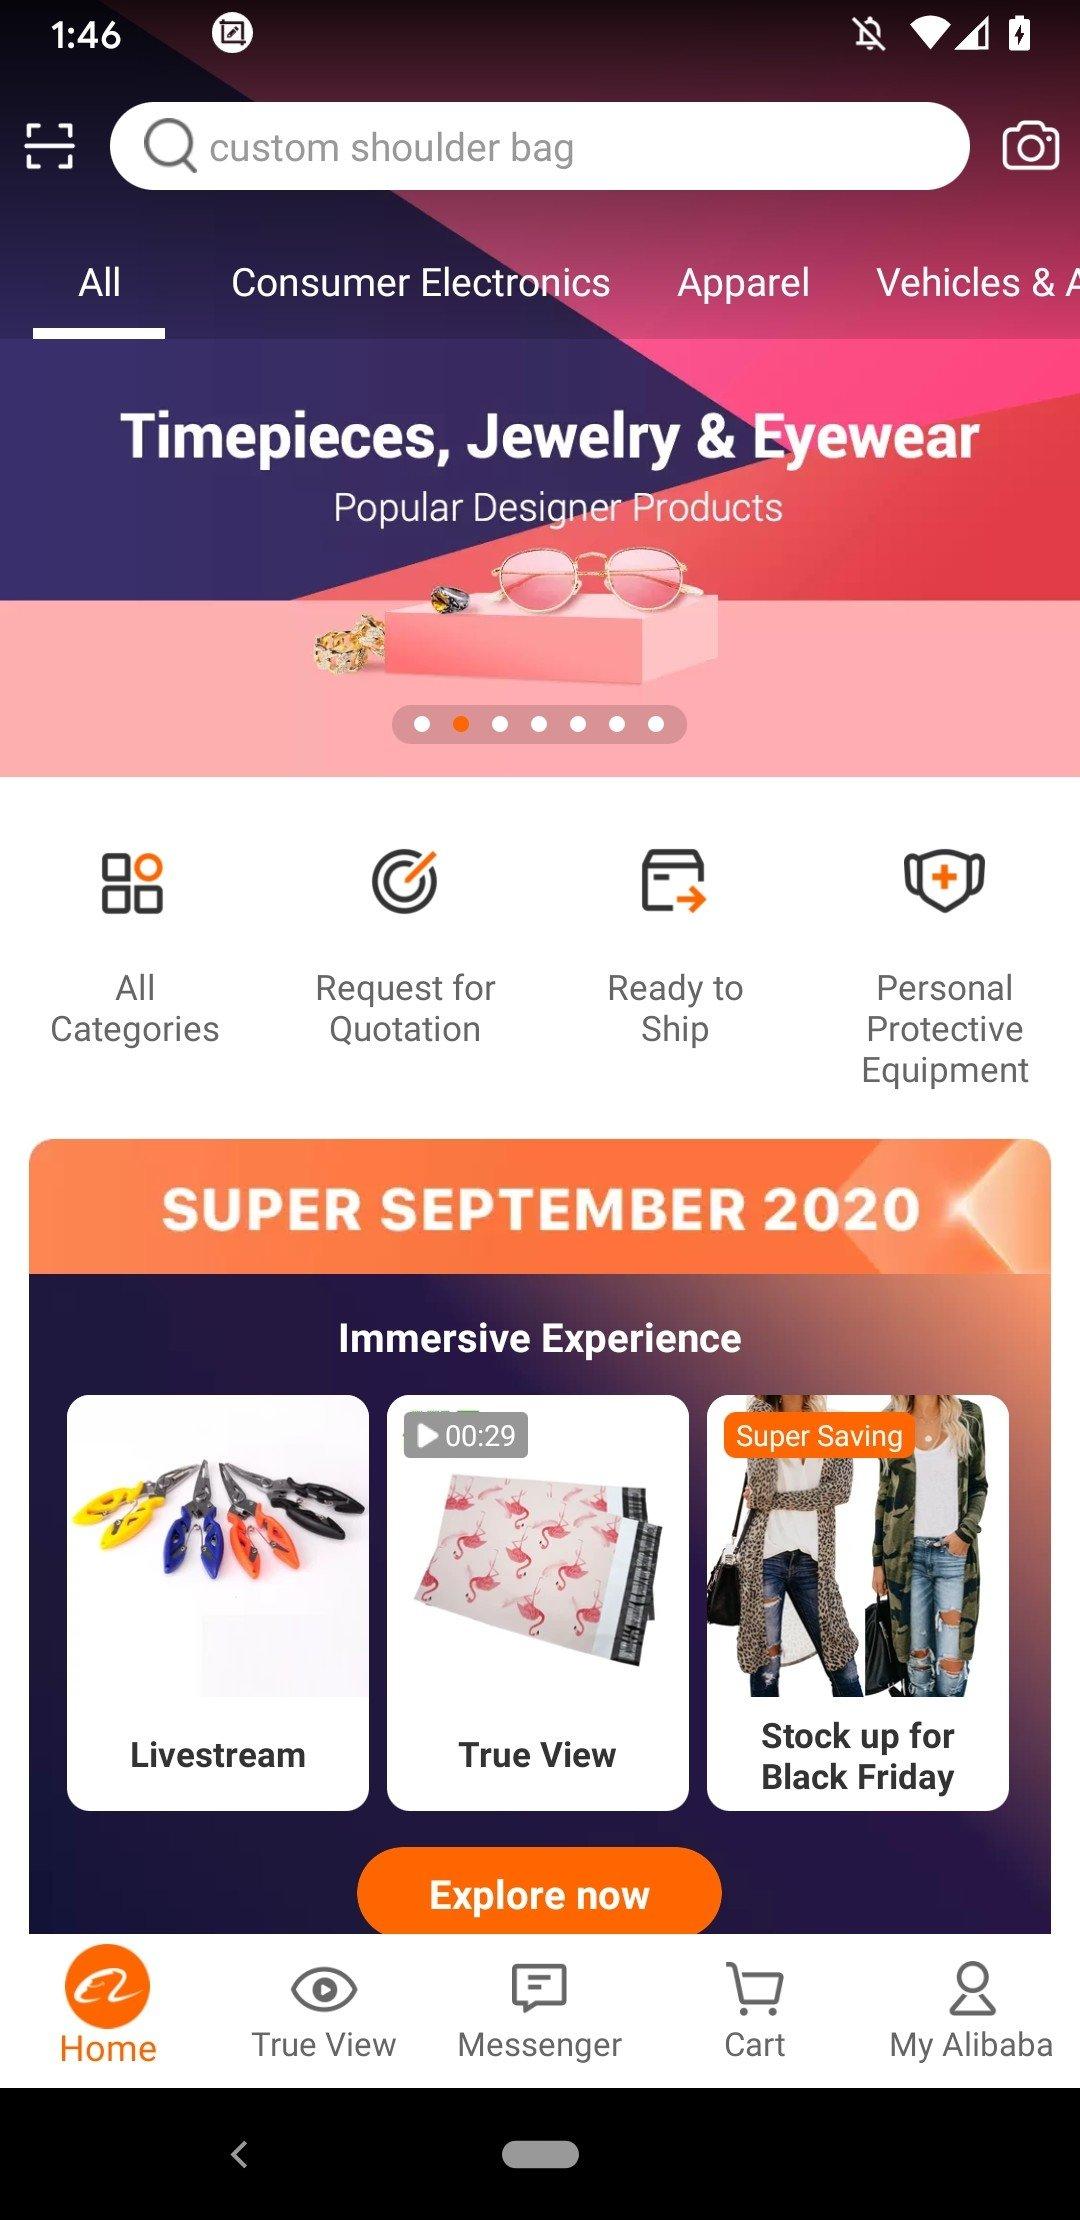 App de vente B2B d'Alibaba.com Android image 8